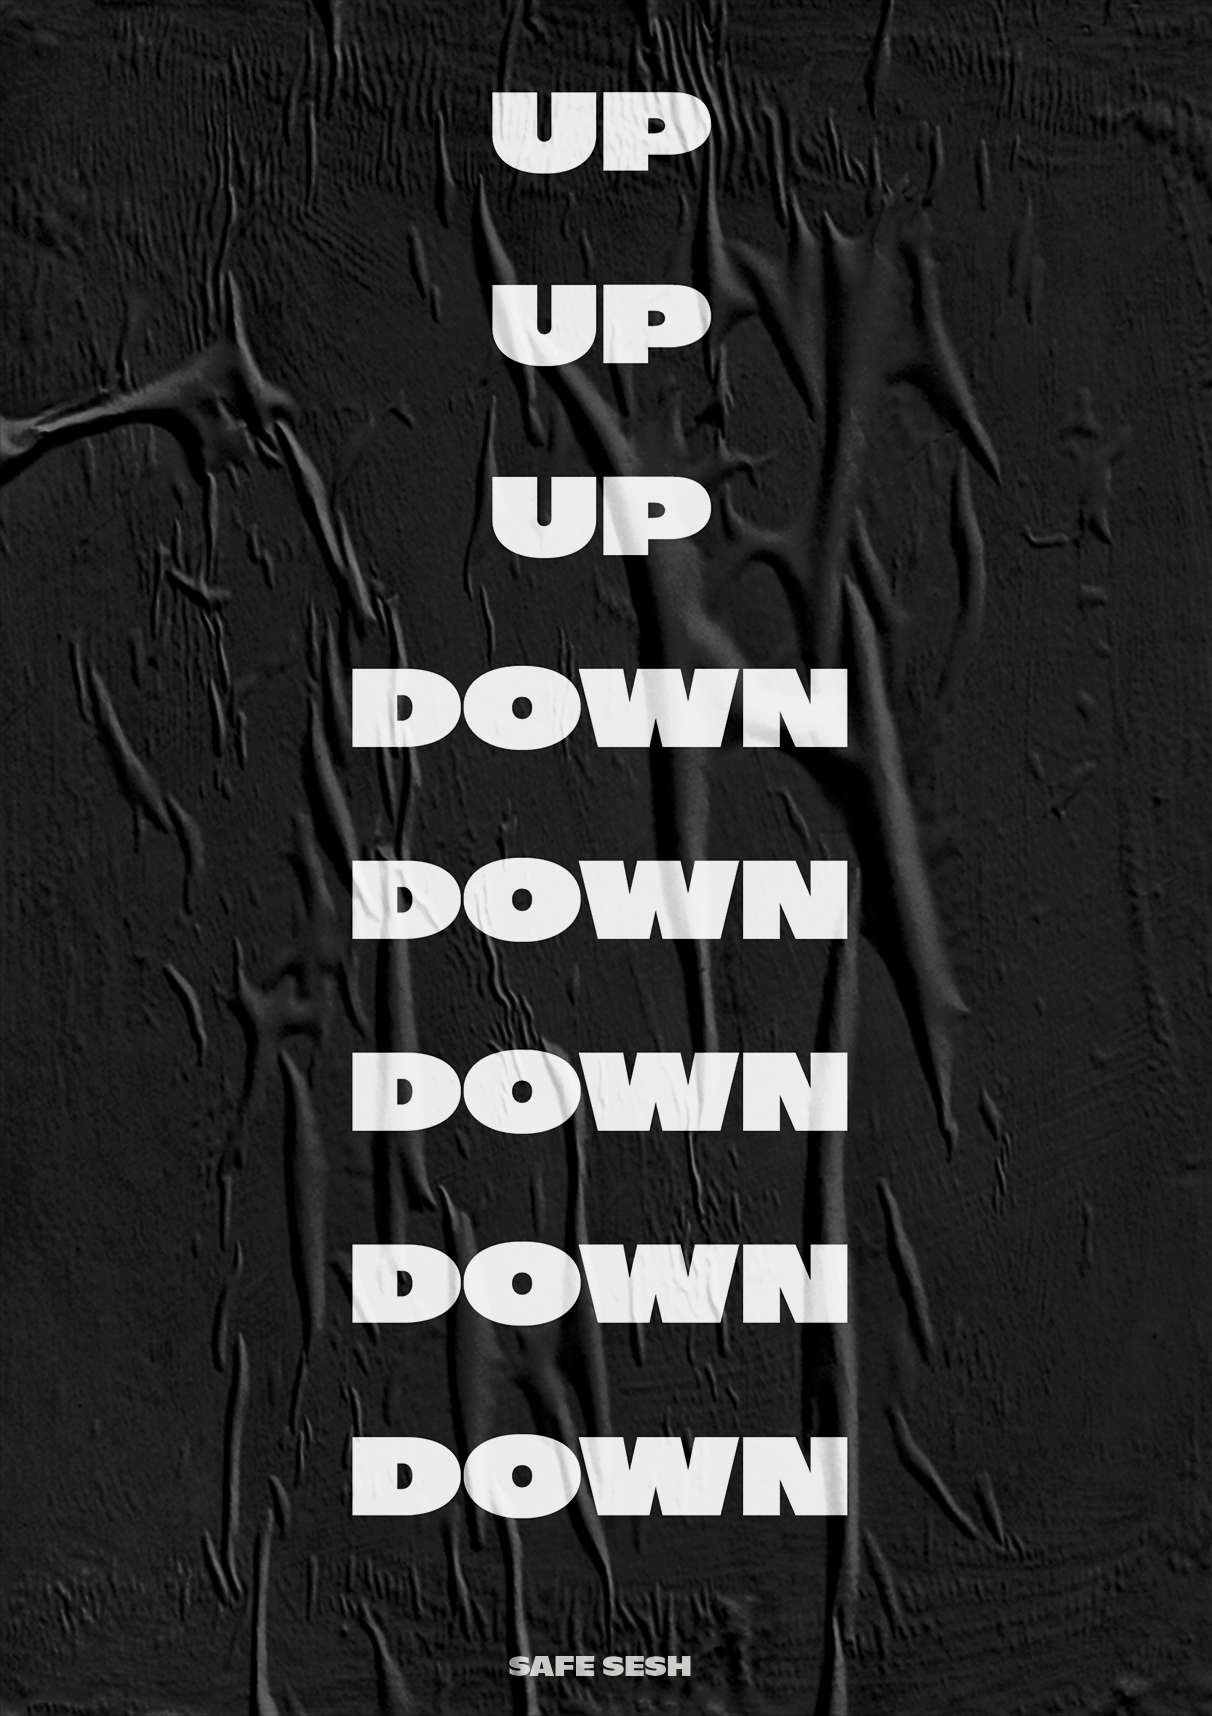 Safe-Sesh-Up_Up_Down.png